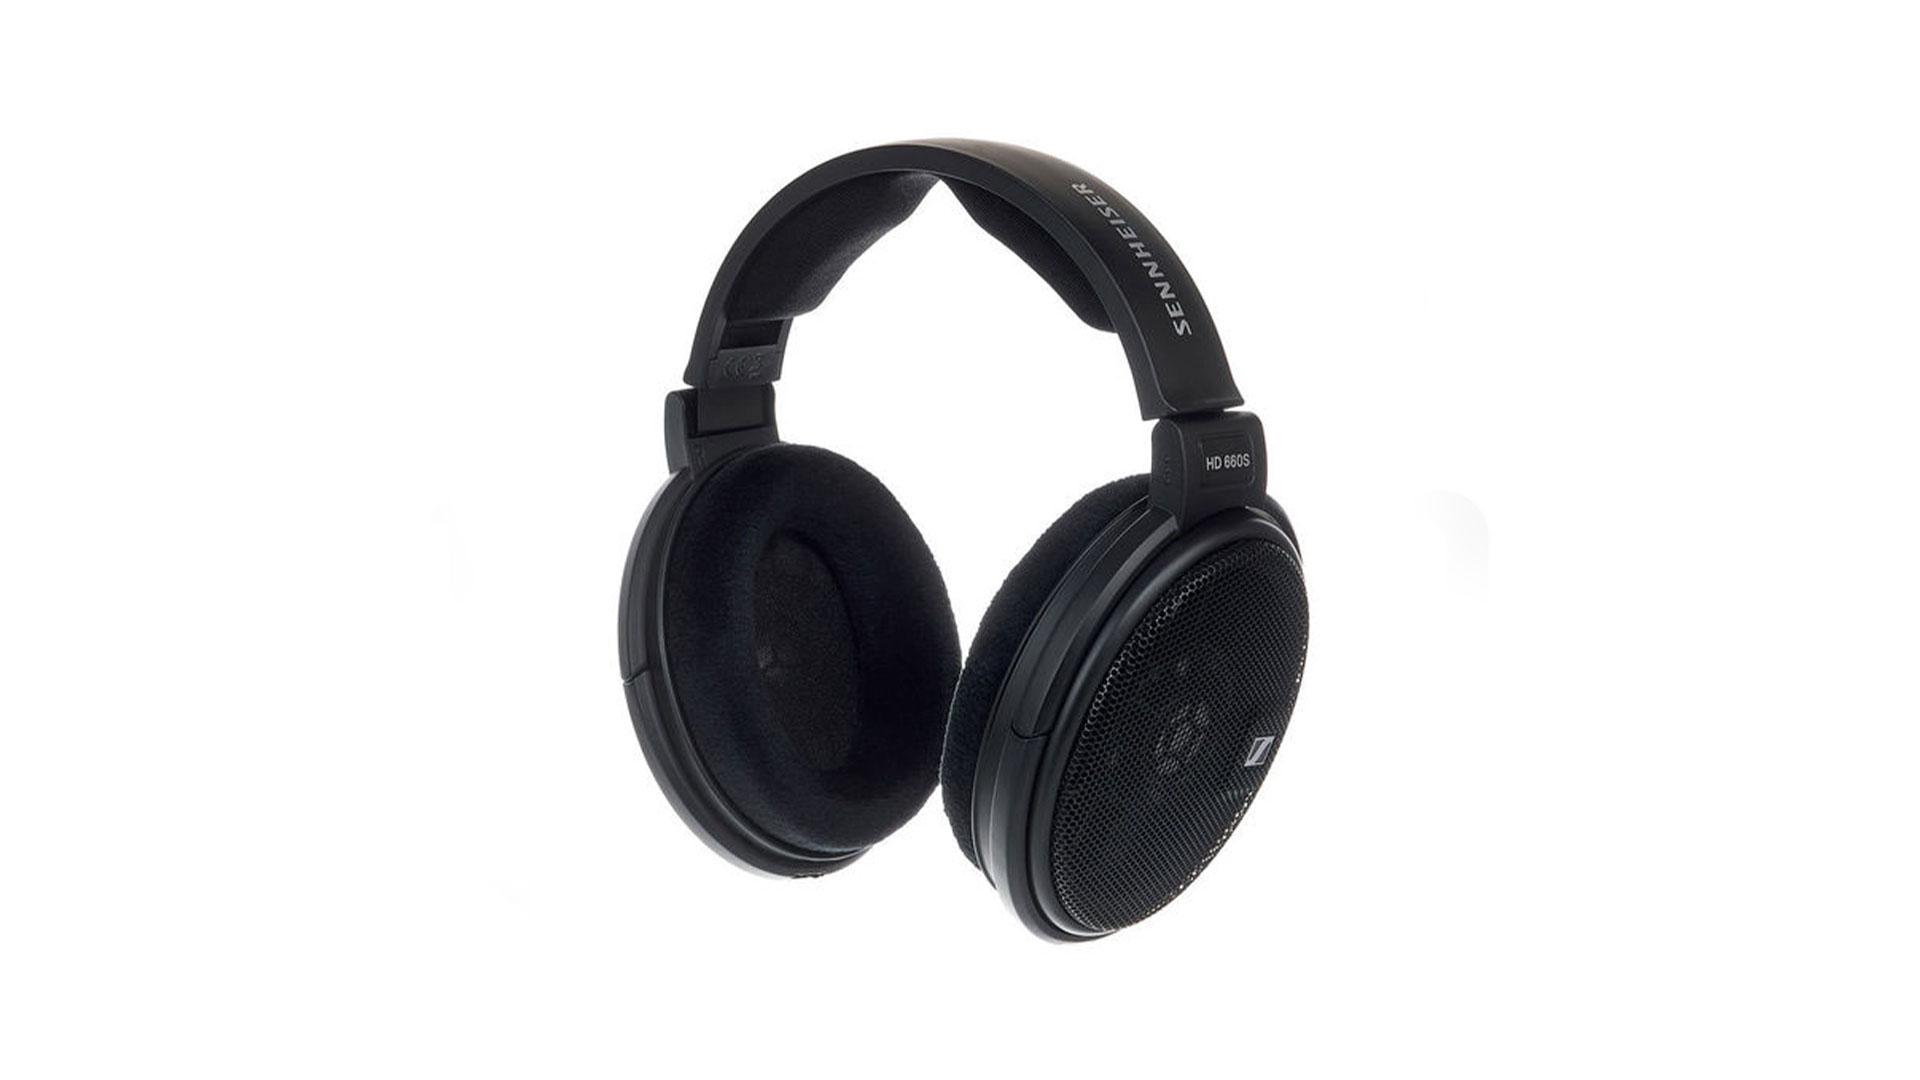 Top HiFi Headphones